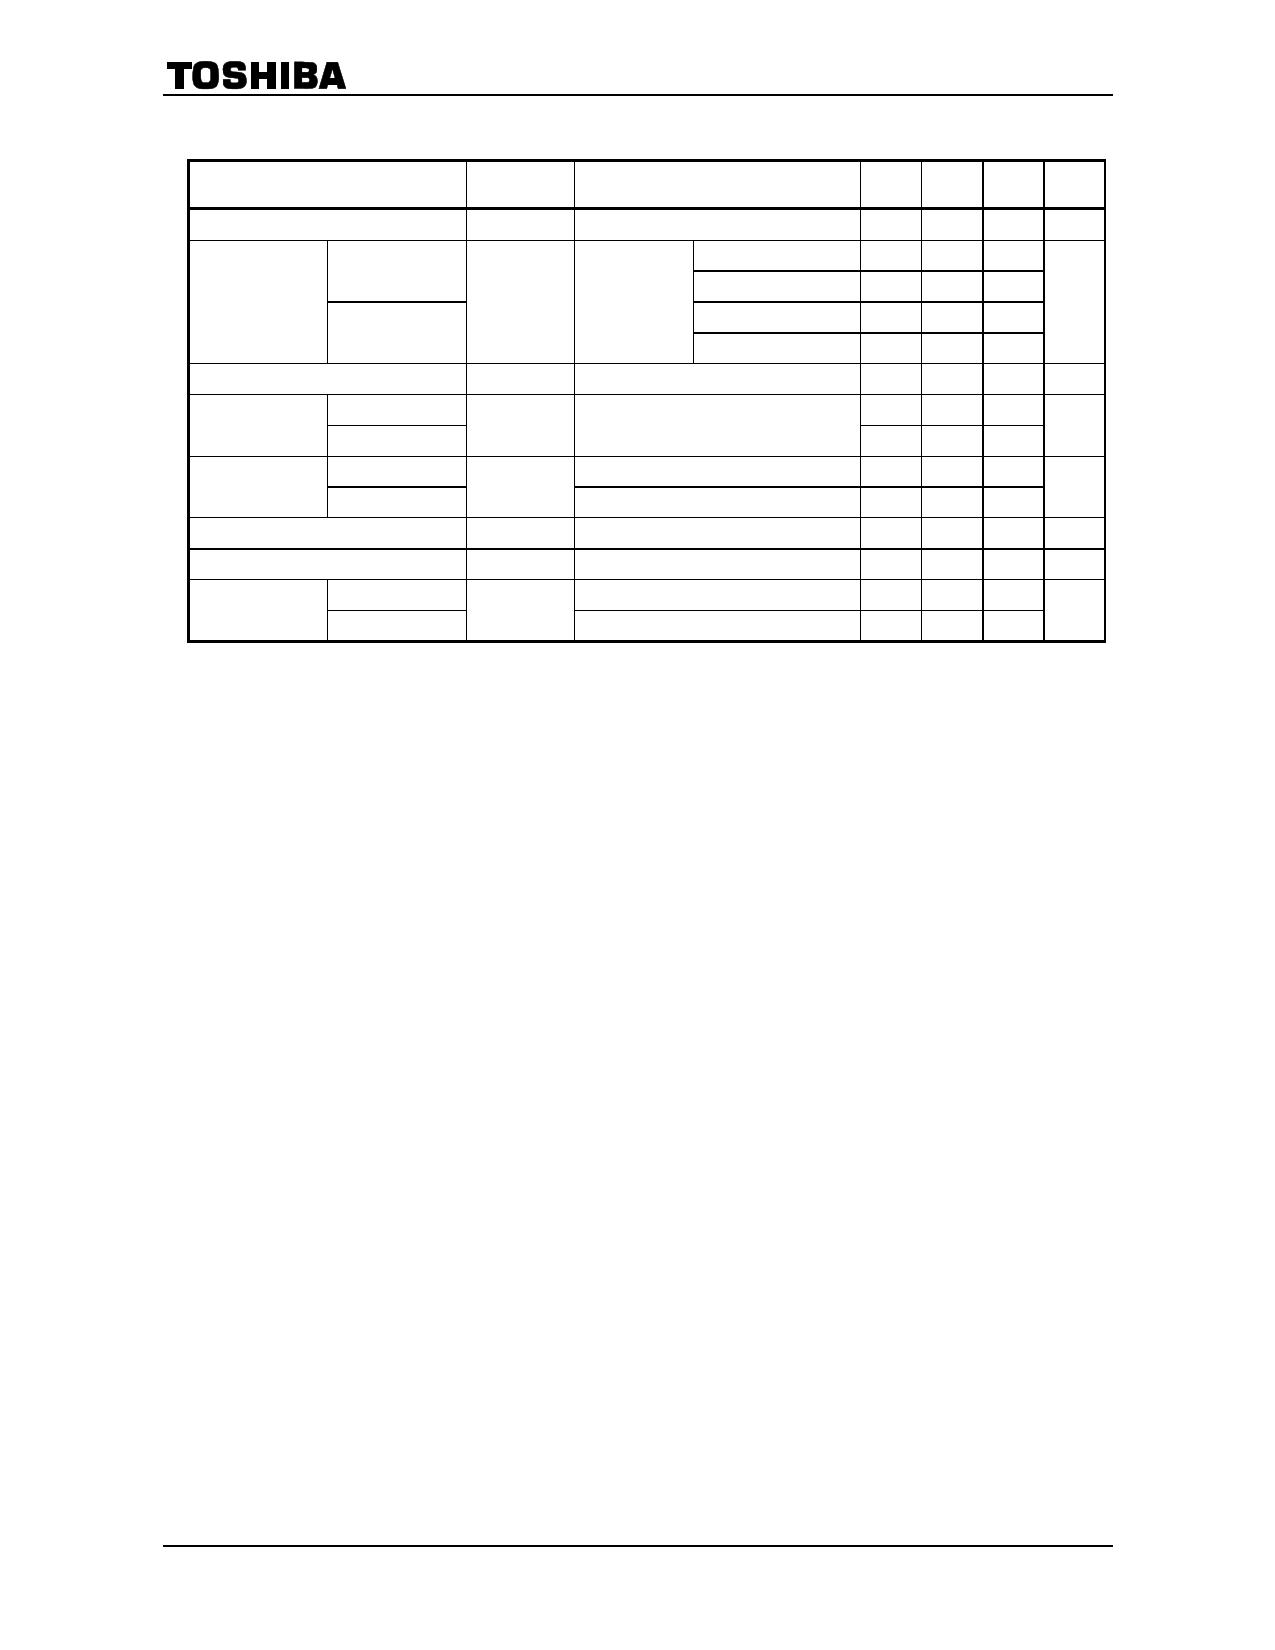 ULN2004AFW pdf, ピン配列